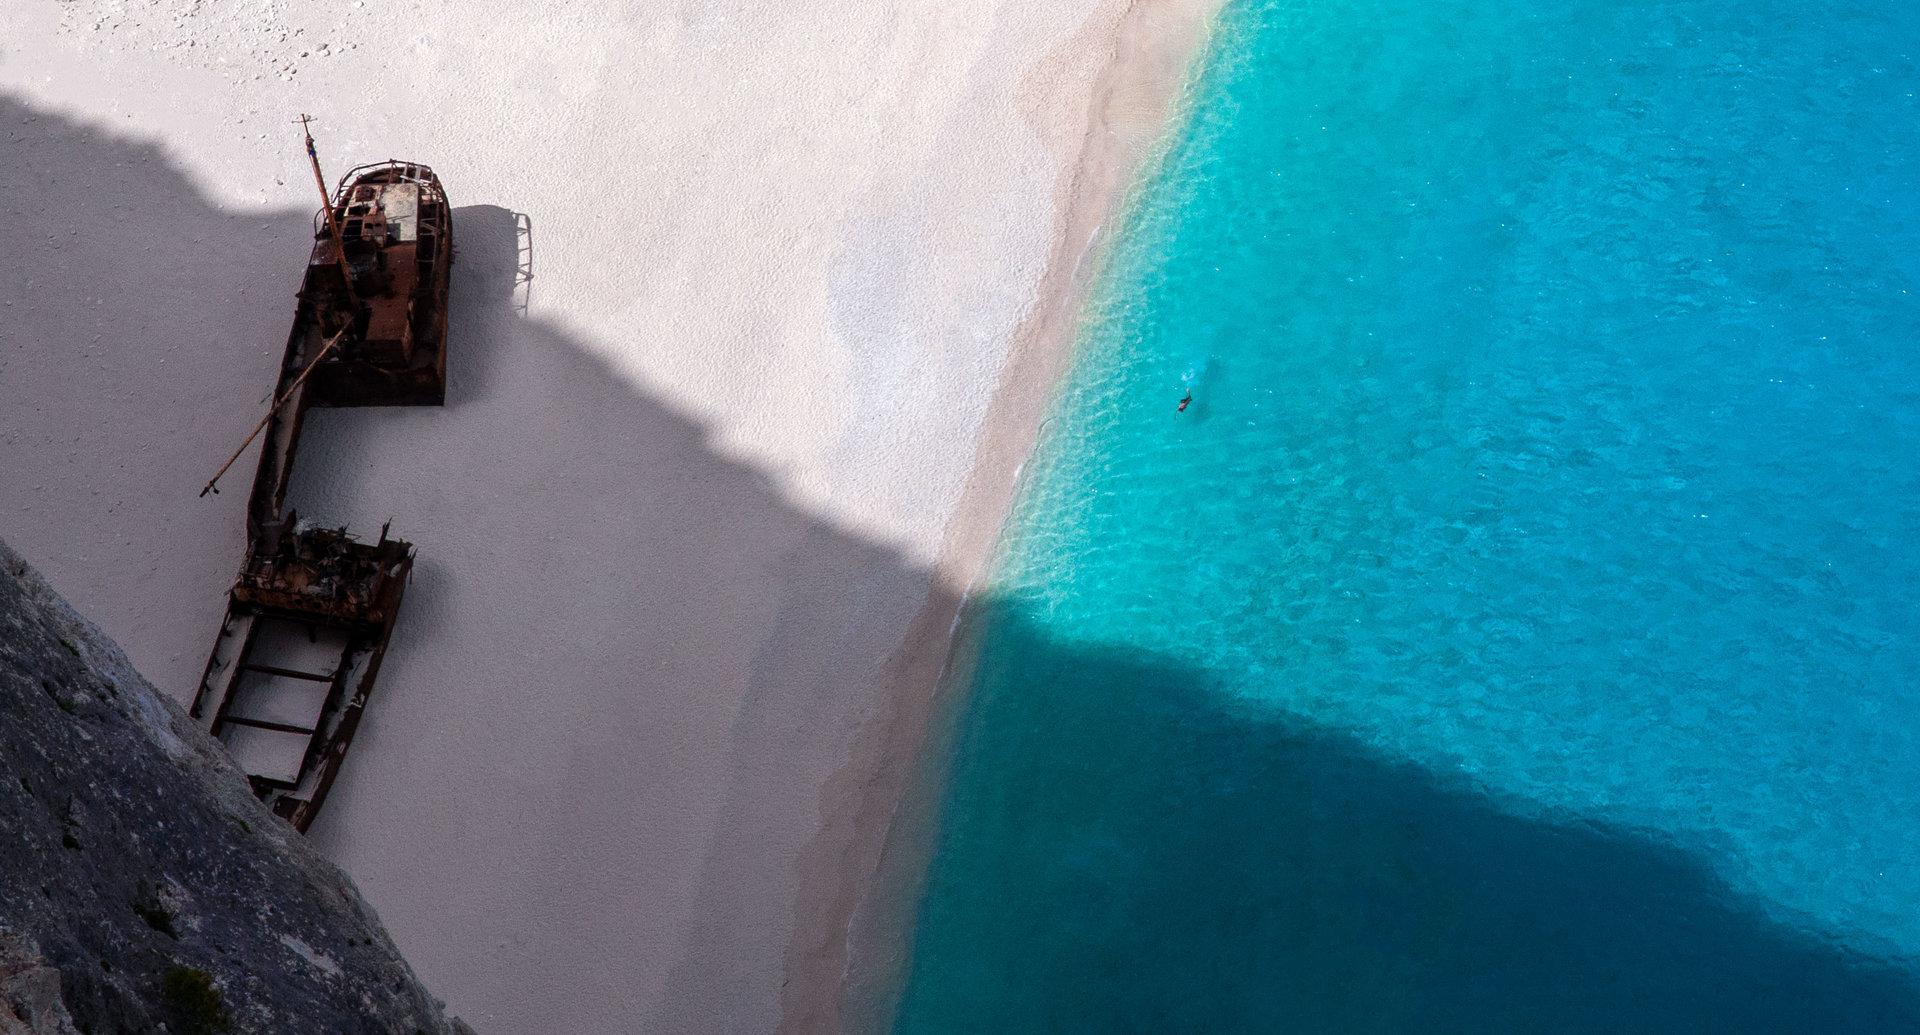 The beach... | Author Dimityr Pavlov - doctoraaa | PHOTO FORUM